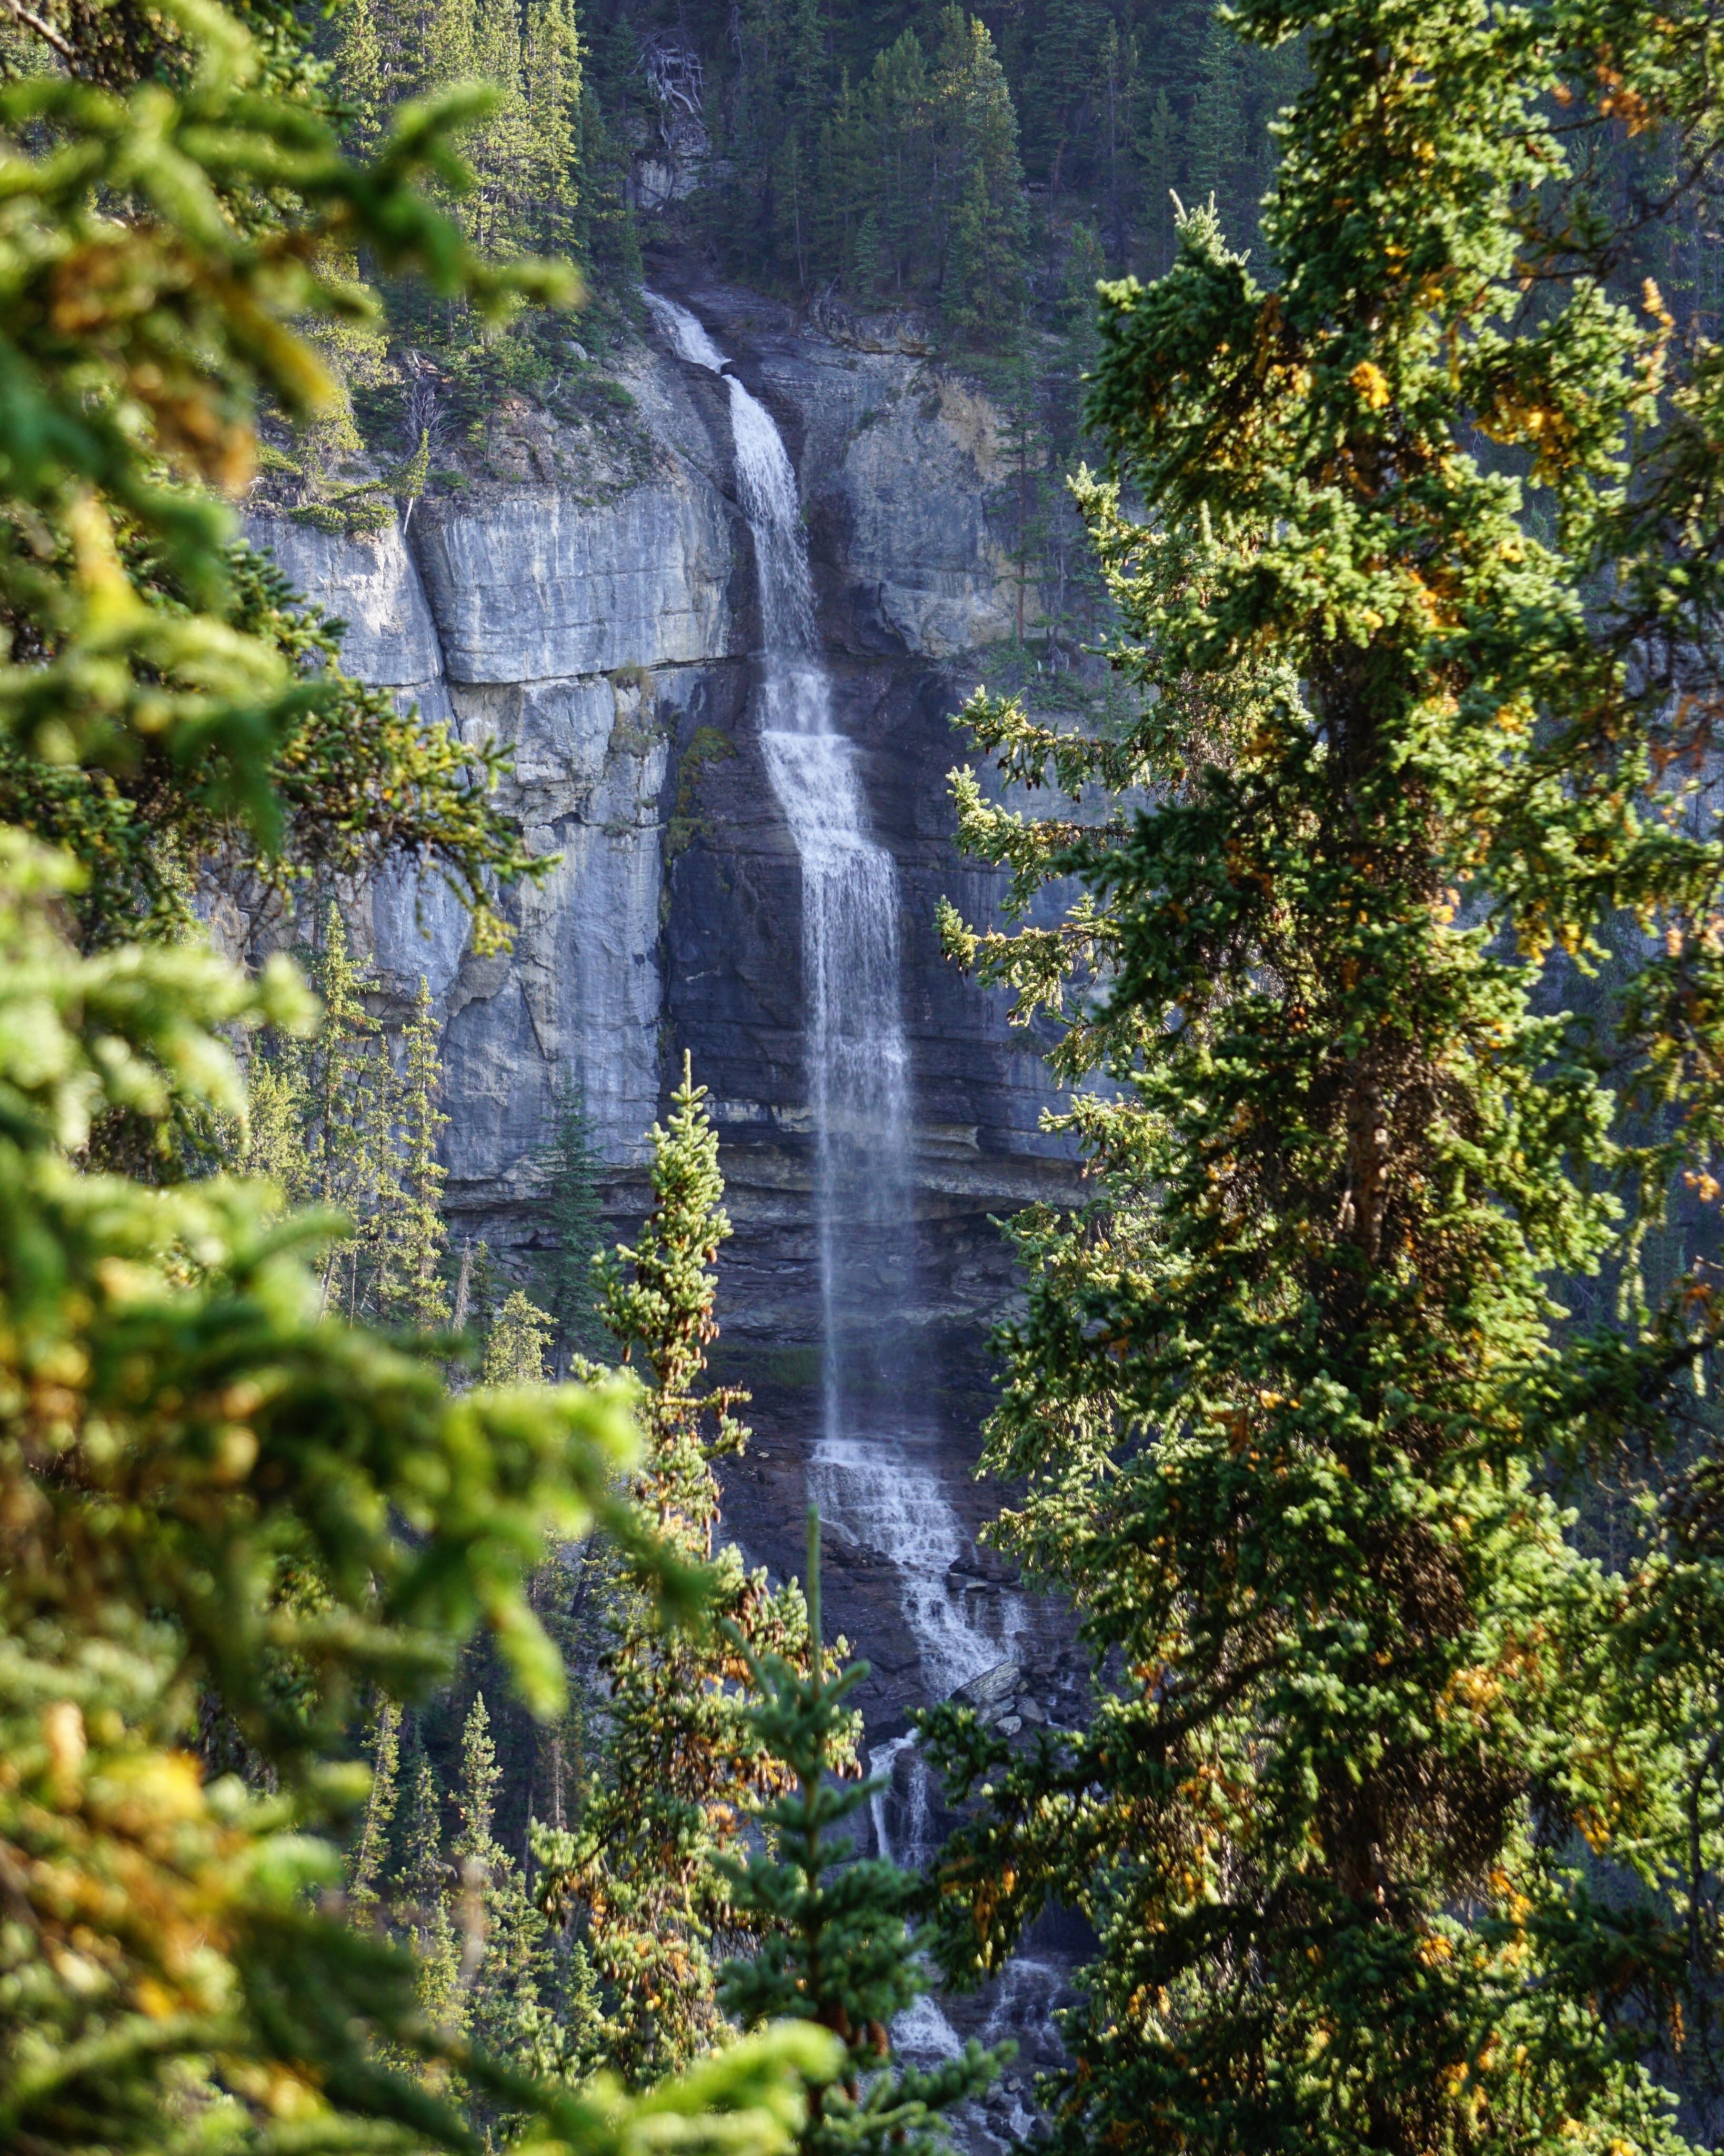 Natural frame for Bridal Veil Falls (3276x4096) [OC] | Outdoor ...